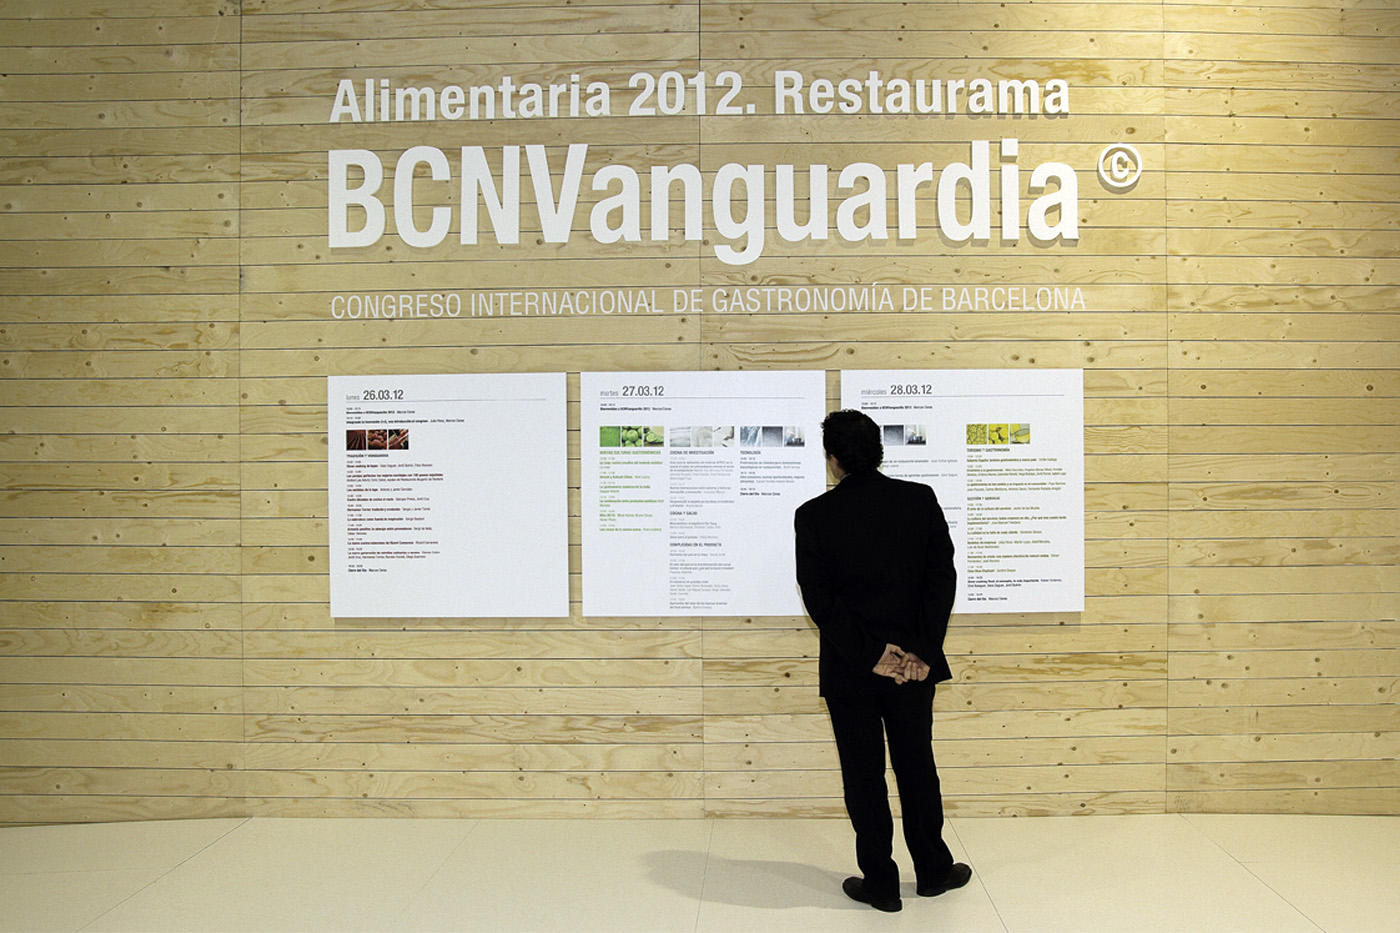 bcn-vanguardia-alimentaria-exhibitions-evento-disseny-creartiva